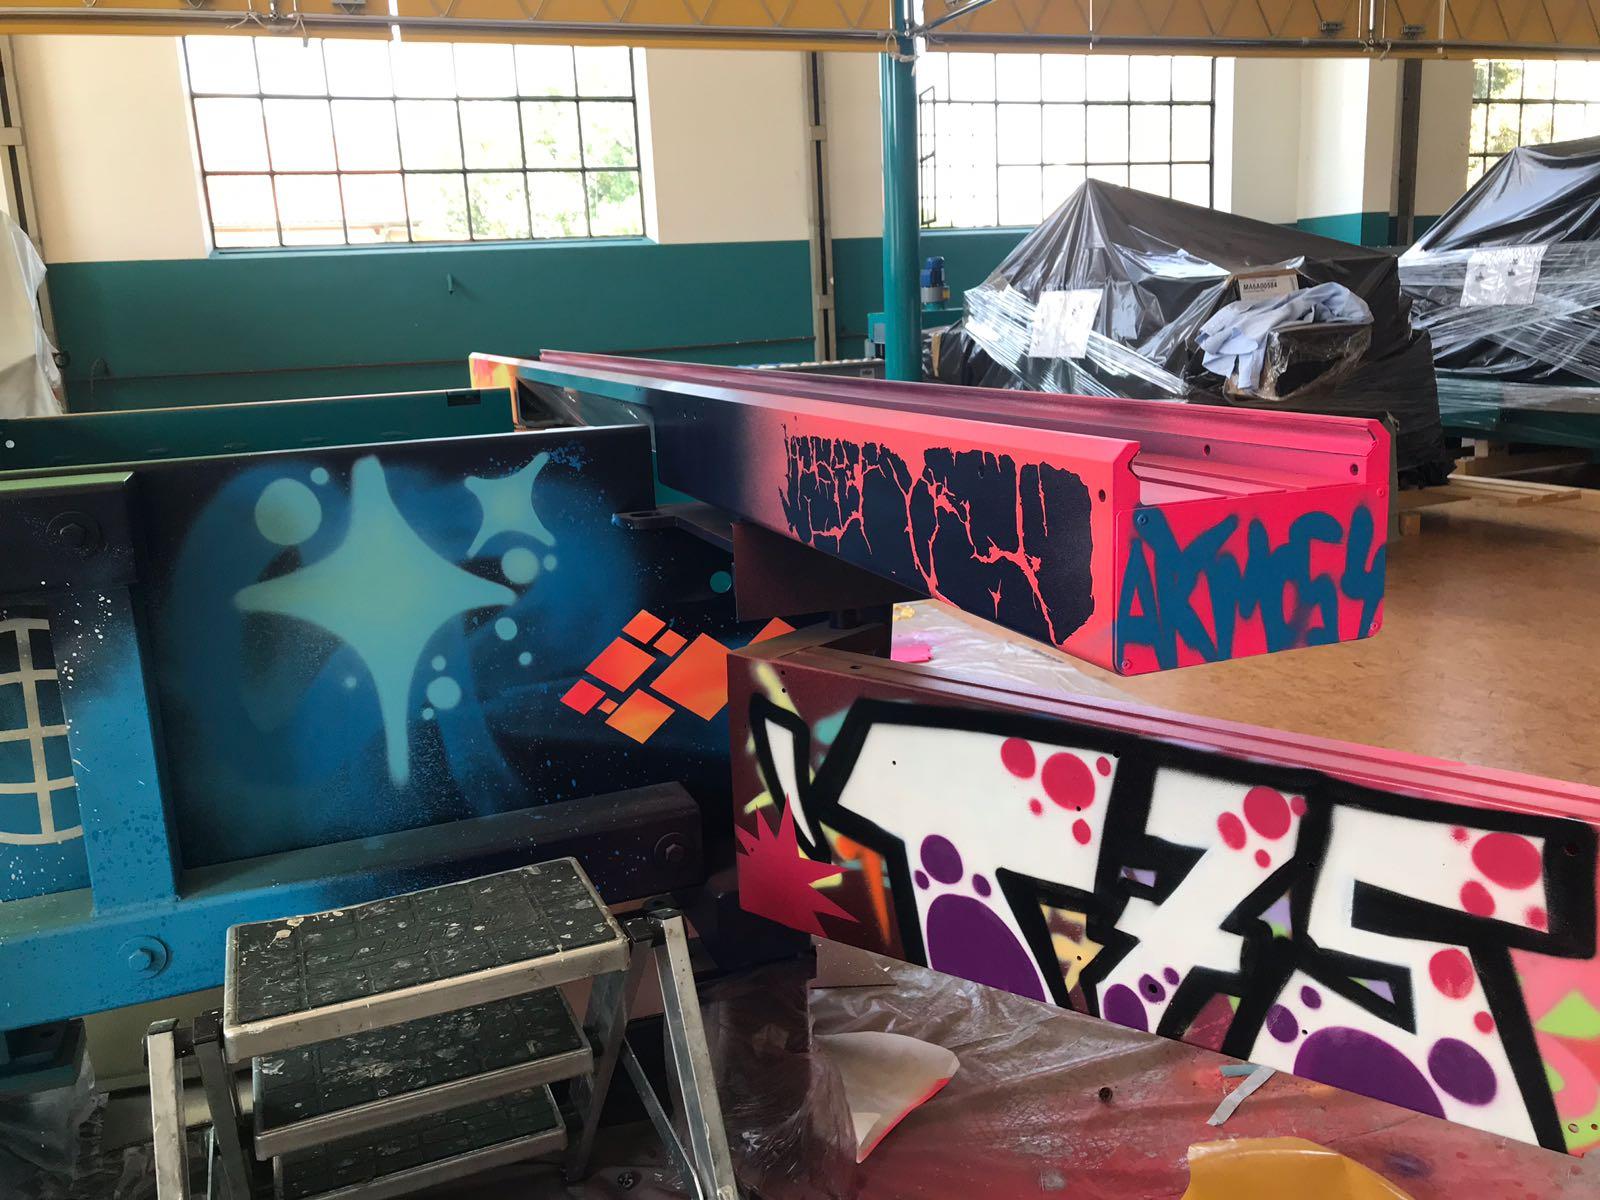 otto-martin-gmbh-formatkreissaege-graffitiauftrag-graffitikuenstler-artmos4-graffiti-syle-tag-streetart-maschine